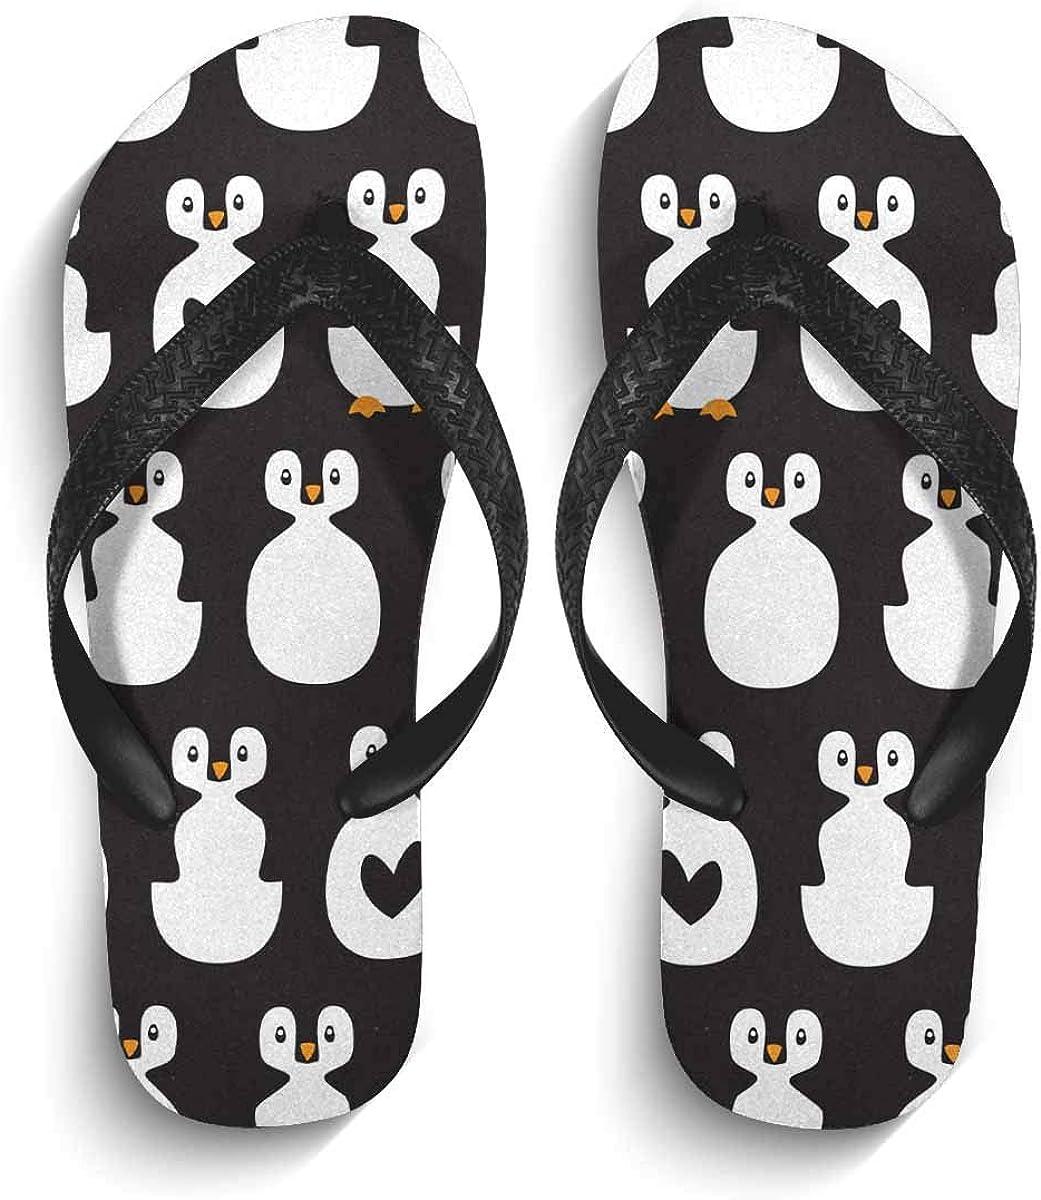 INTERESTPRINT Non-Slip Flip Flop Slippers Cute Penguins and Hearts Black with White Background Black Straps Slim Thong Sandal for Men XL